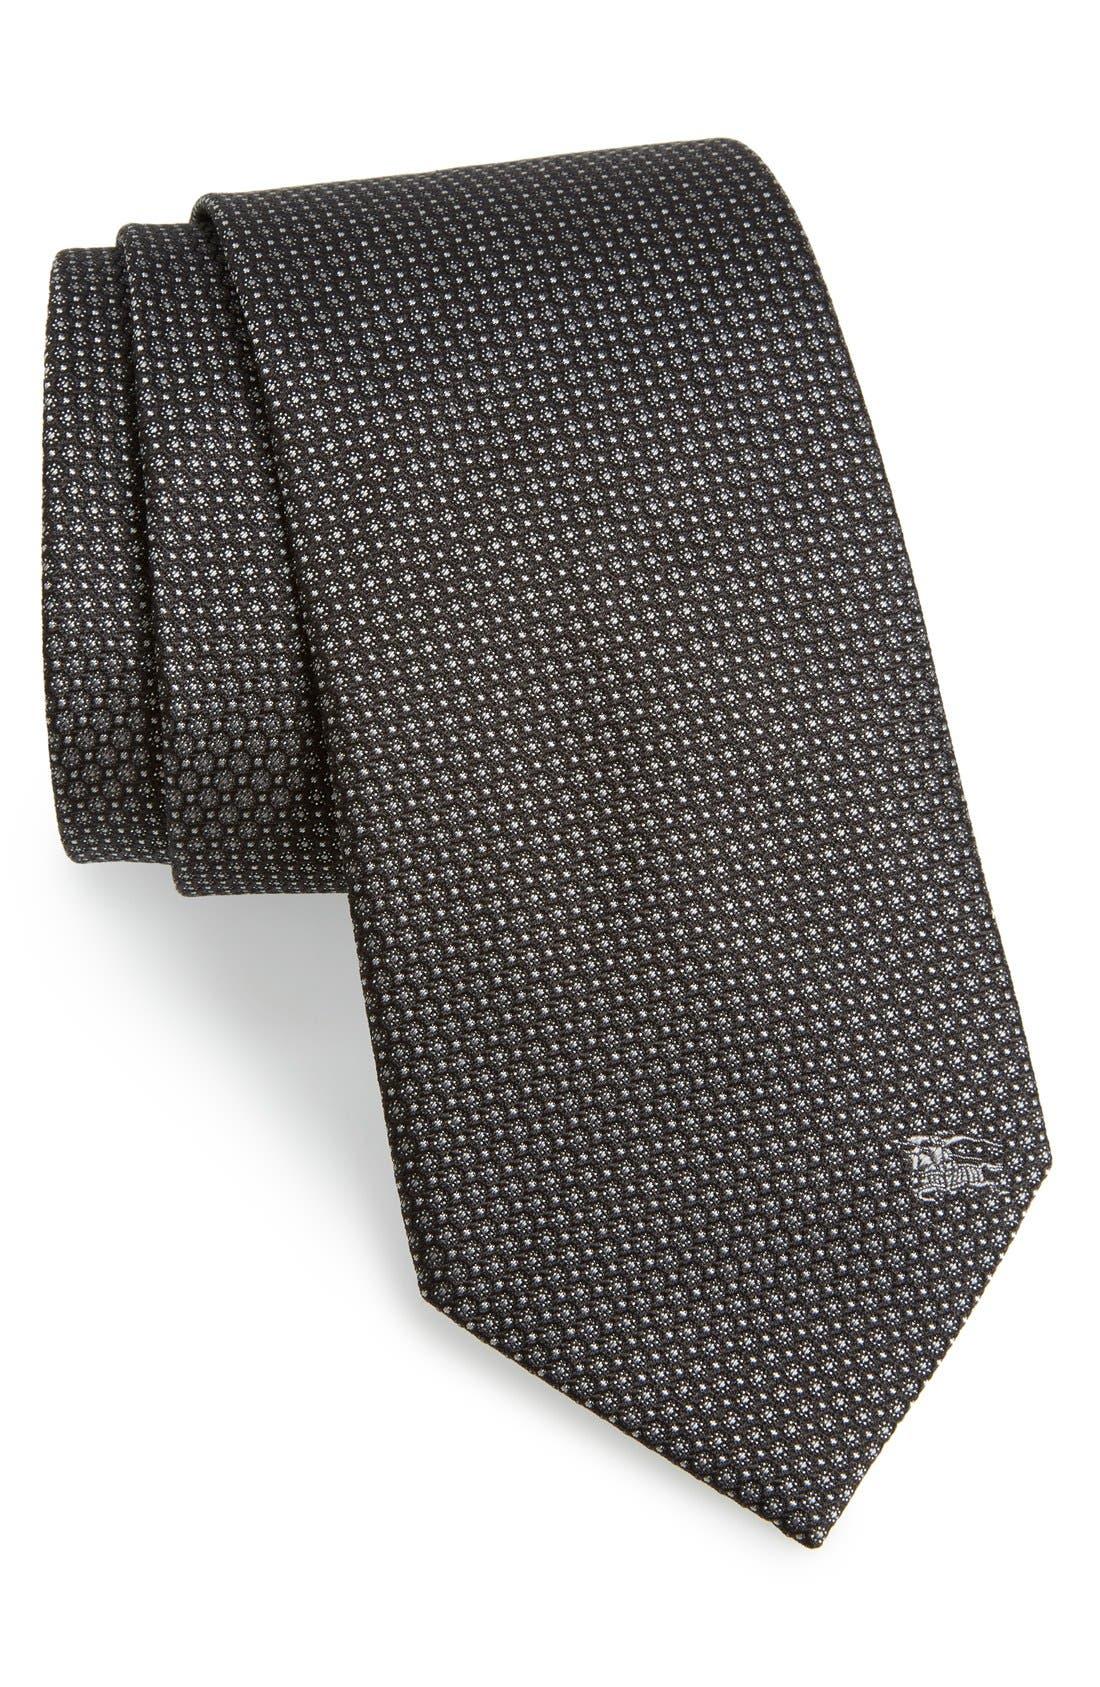 London 'Clinton' Medallion Silk Tie,                         Main,                         color,